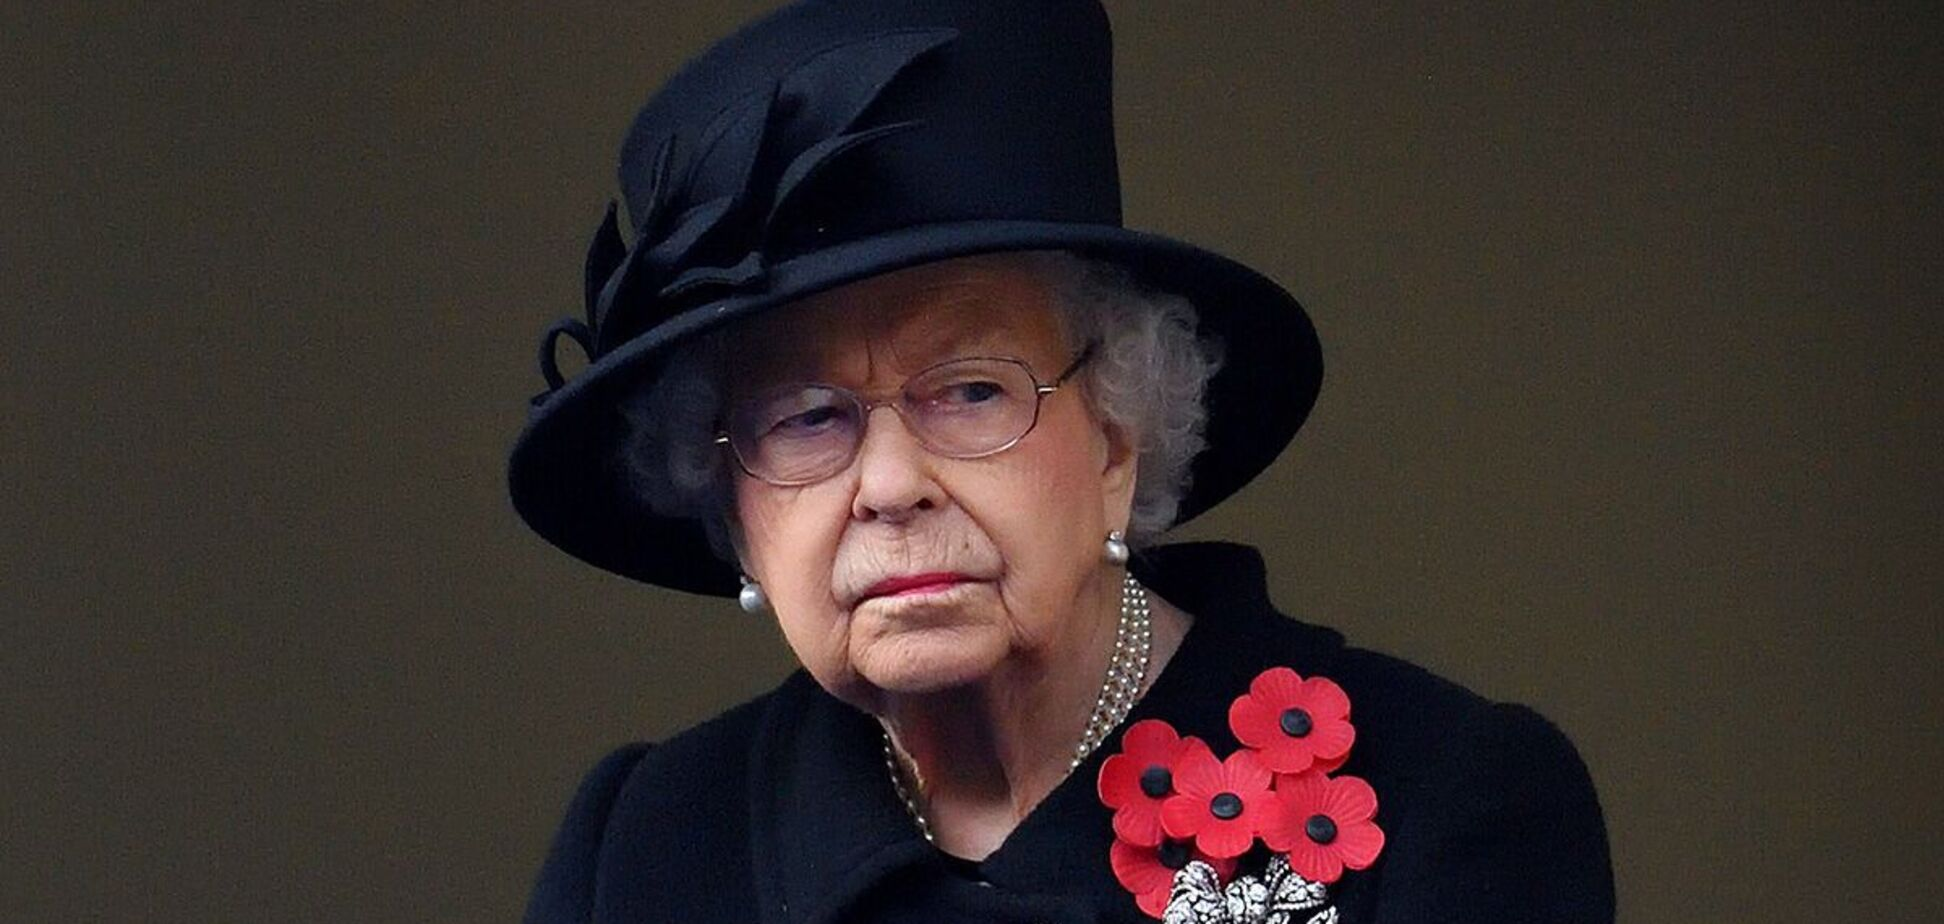 Елизавета II оставила на гробу принца Филиппа письмо со своим детским прозвищем